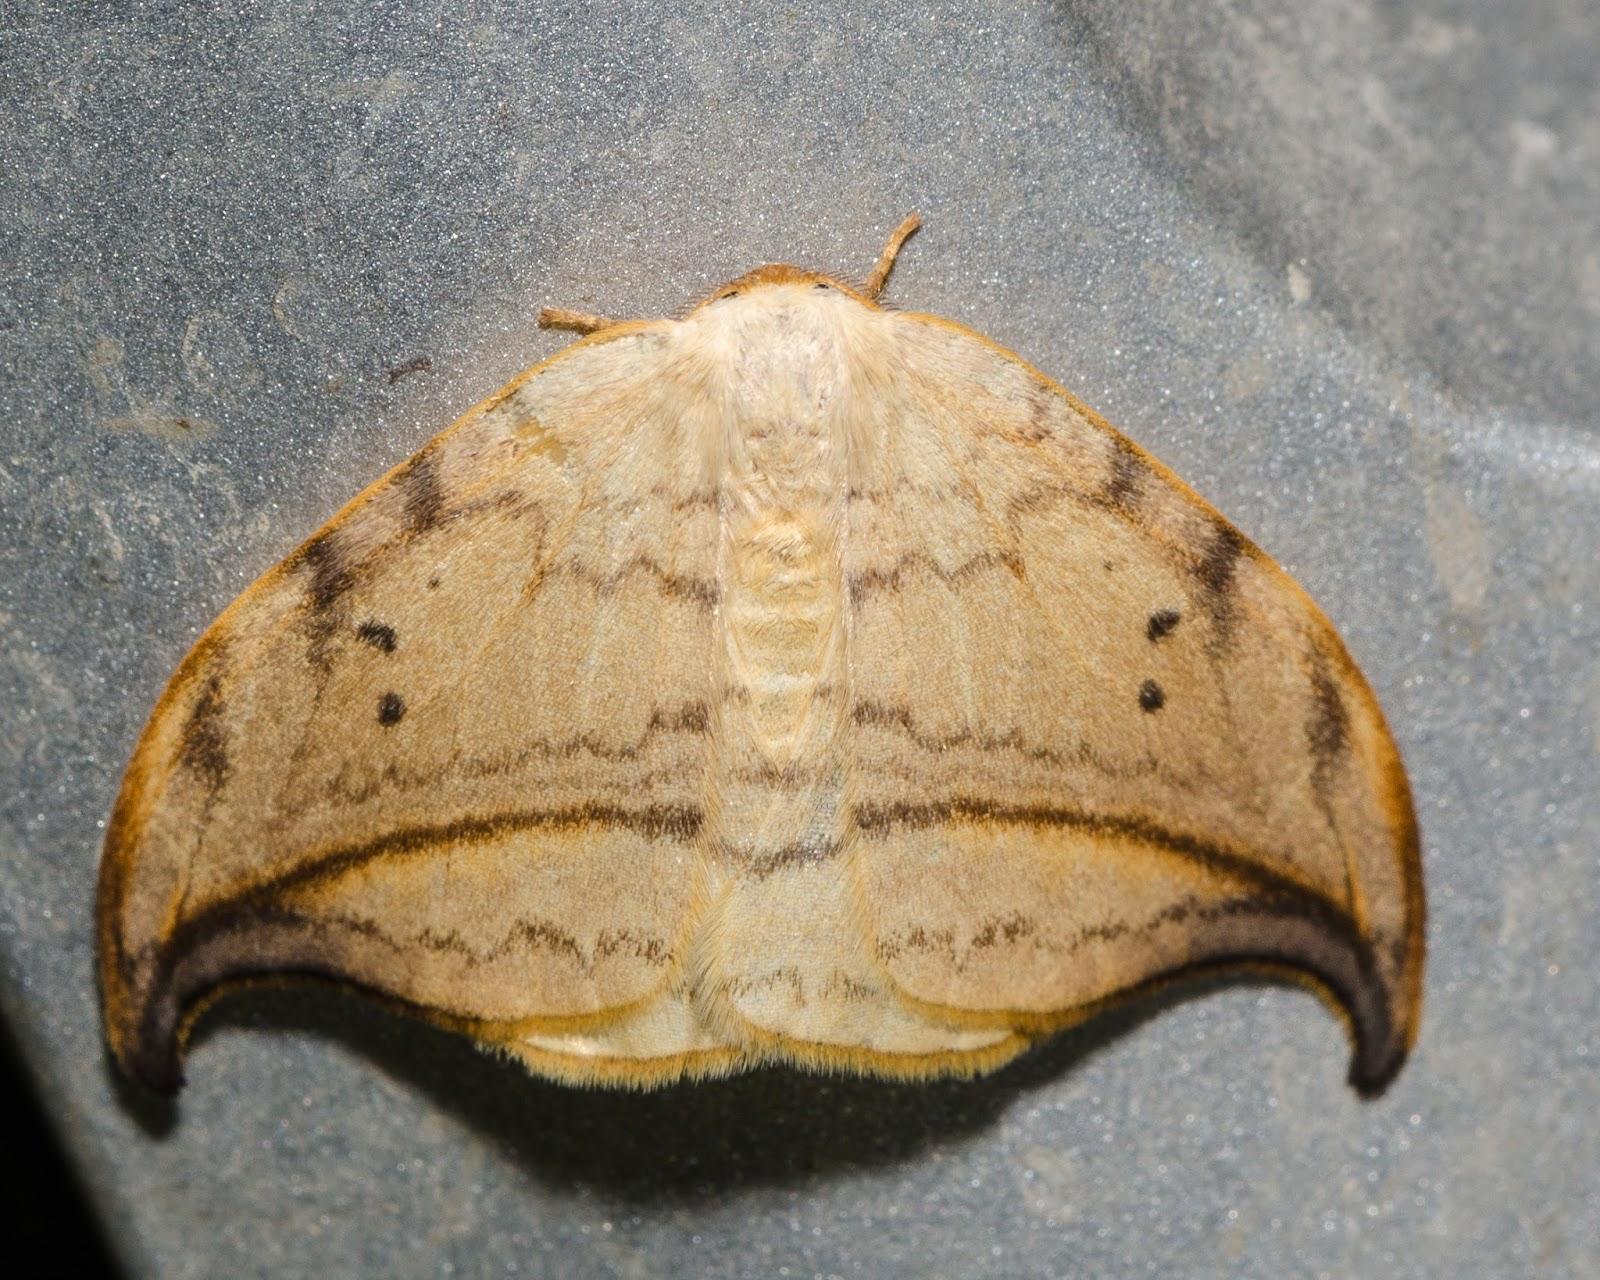 Arched Hooktip (Drepana arcuata)